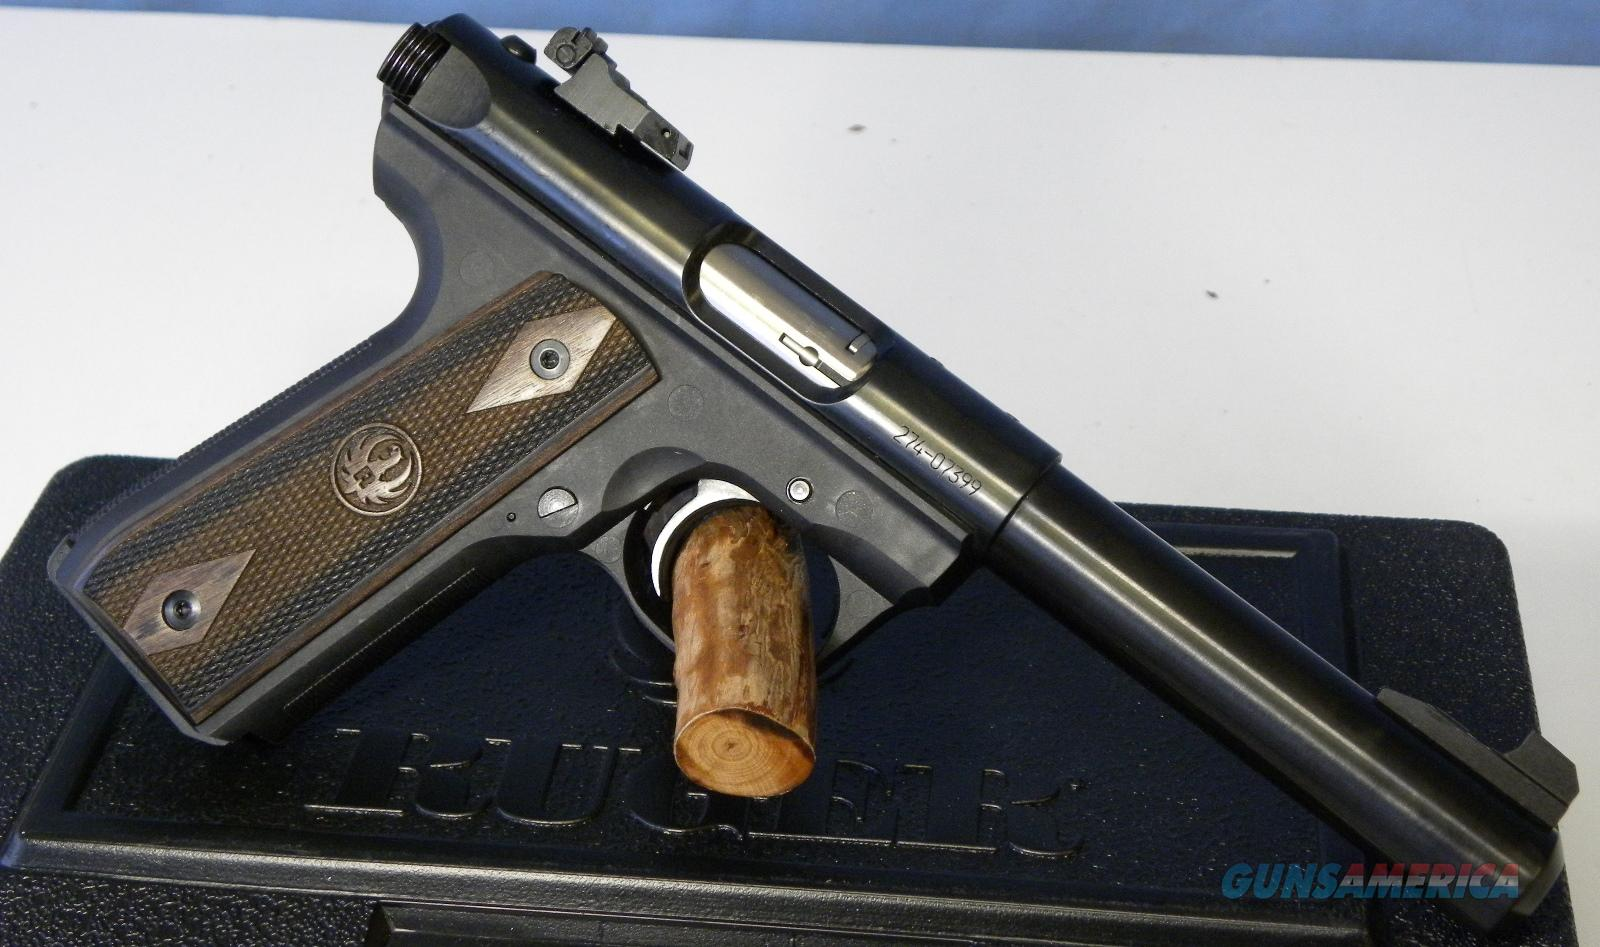 Ruger 22/45 MK III Target 10158  Guns > Pistols > Ruger Semi-Auto Pistols > 22/45